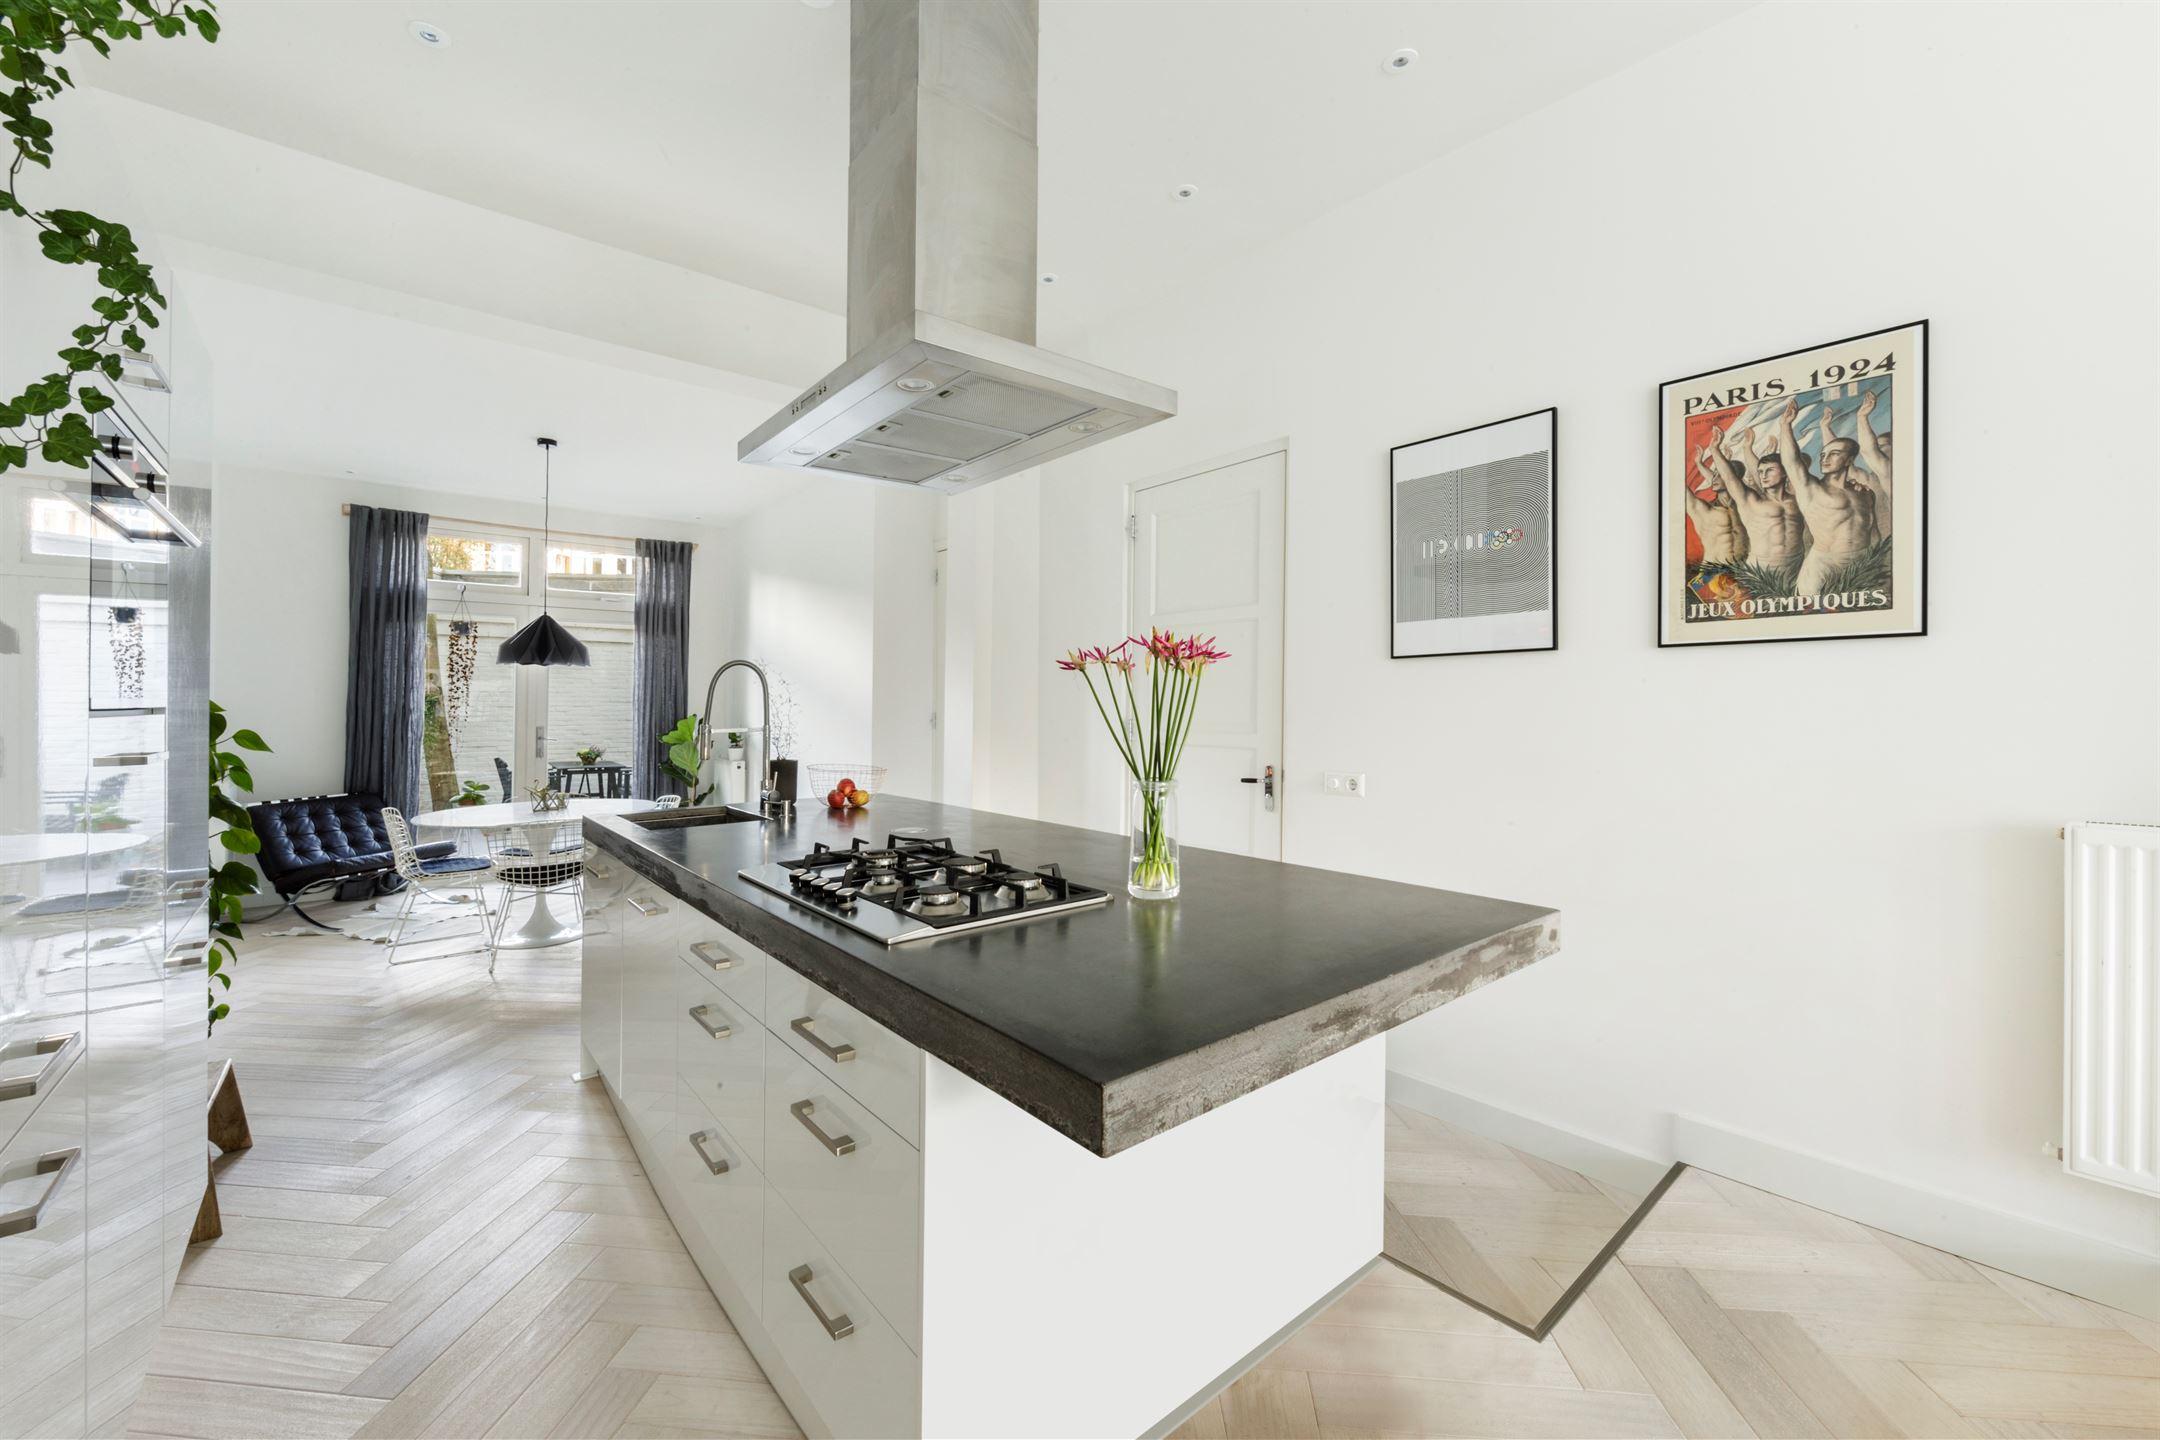 Luxe Badkamer Amsterdam : Appartement te koop pijnackerstraat hs jv amsterdam funda